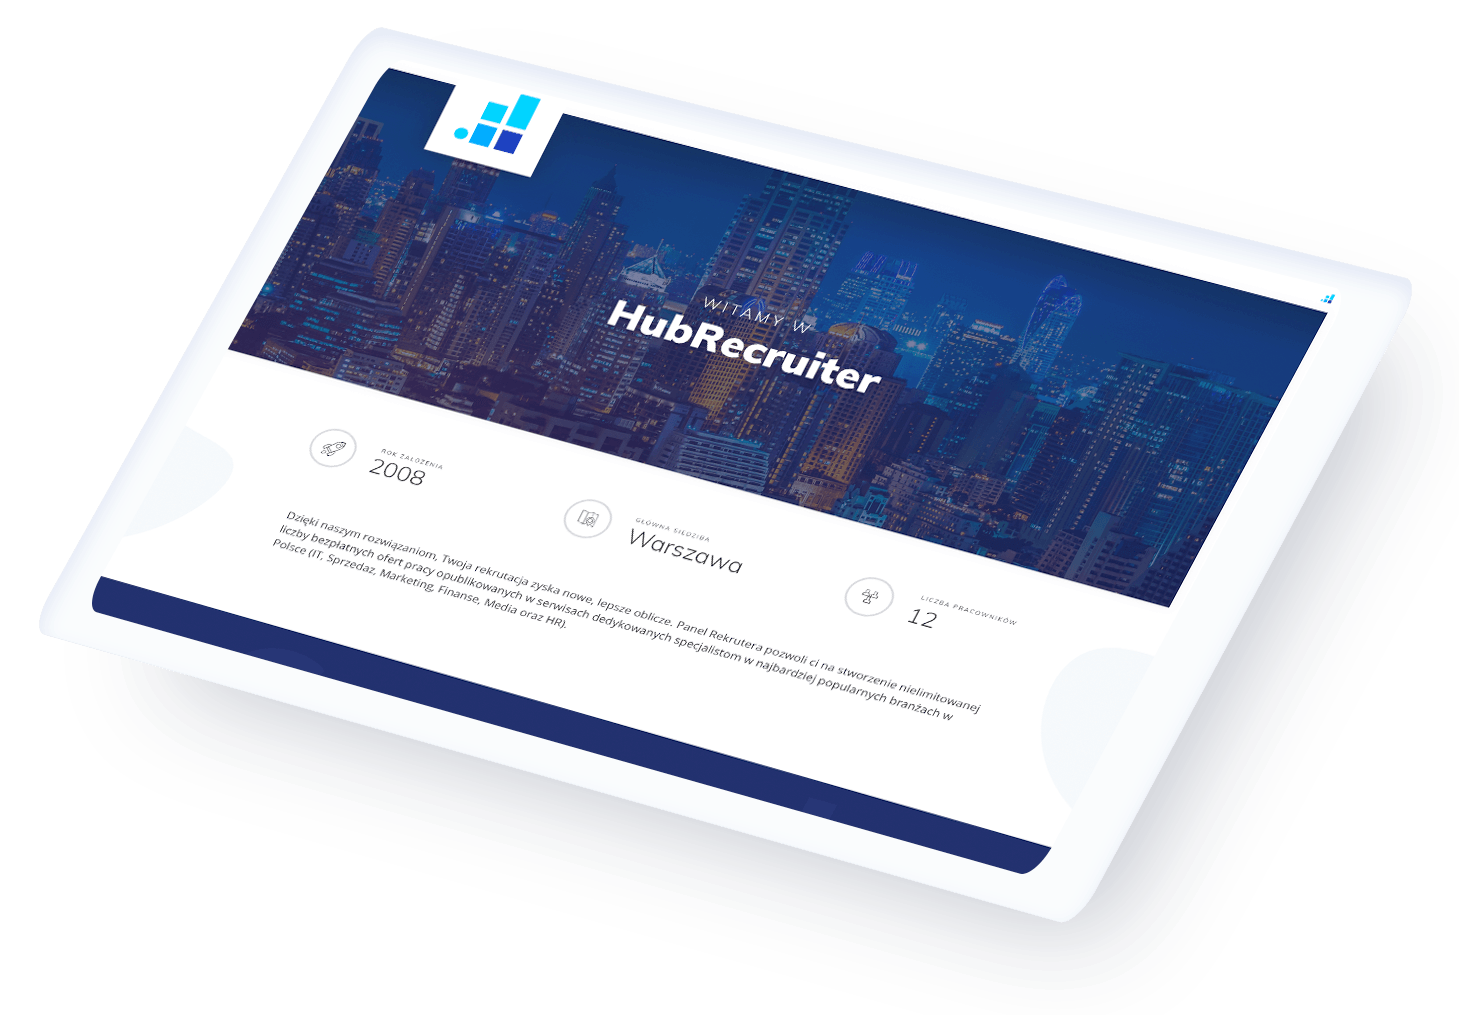 HubRecruiter